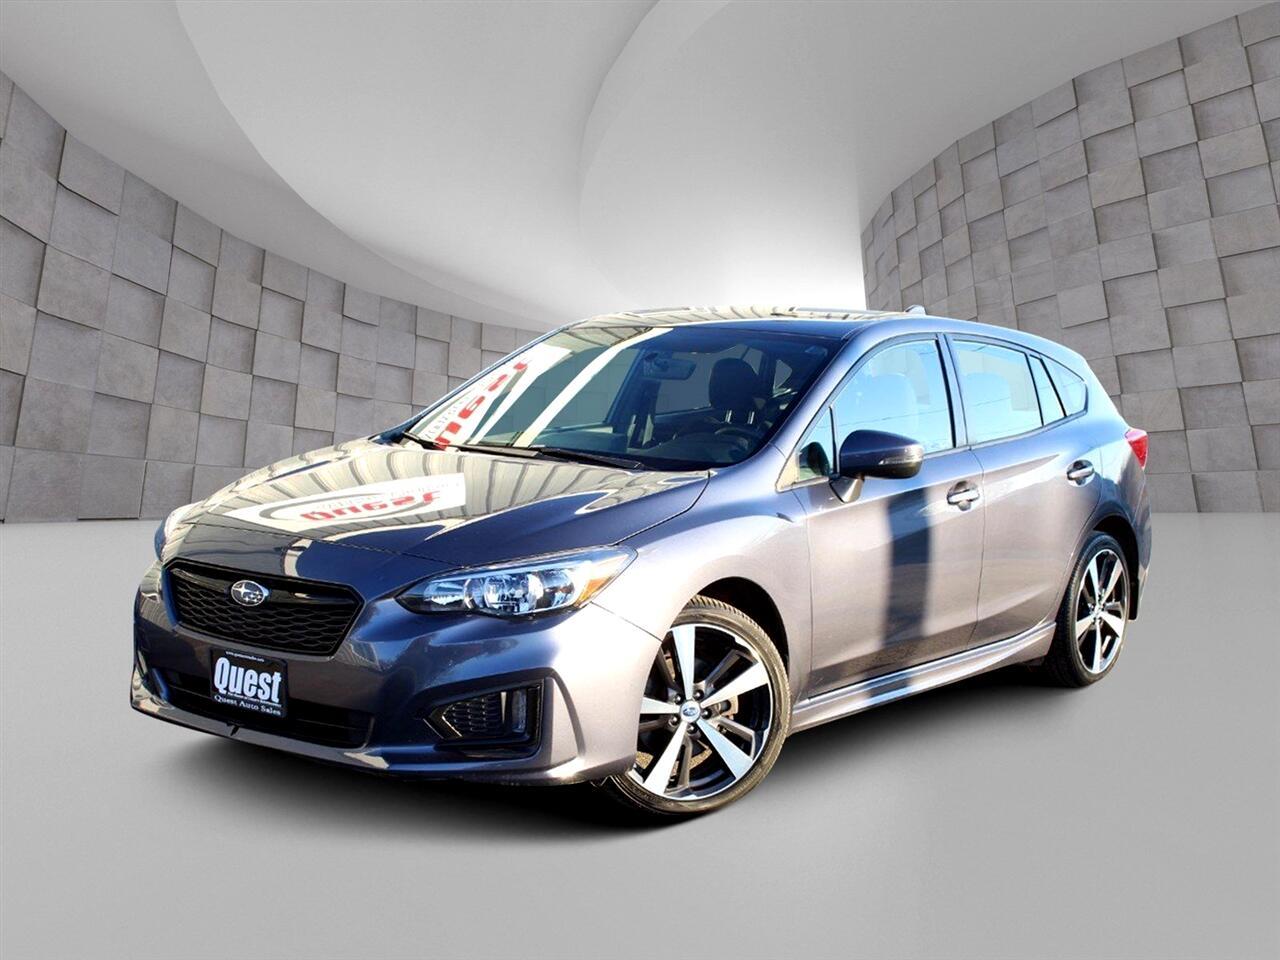 Subaru Impreza 2.0i Sport 5-door CVT 2017